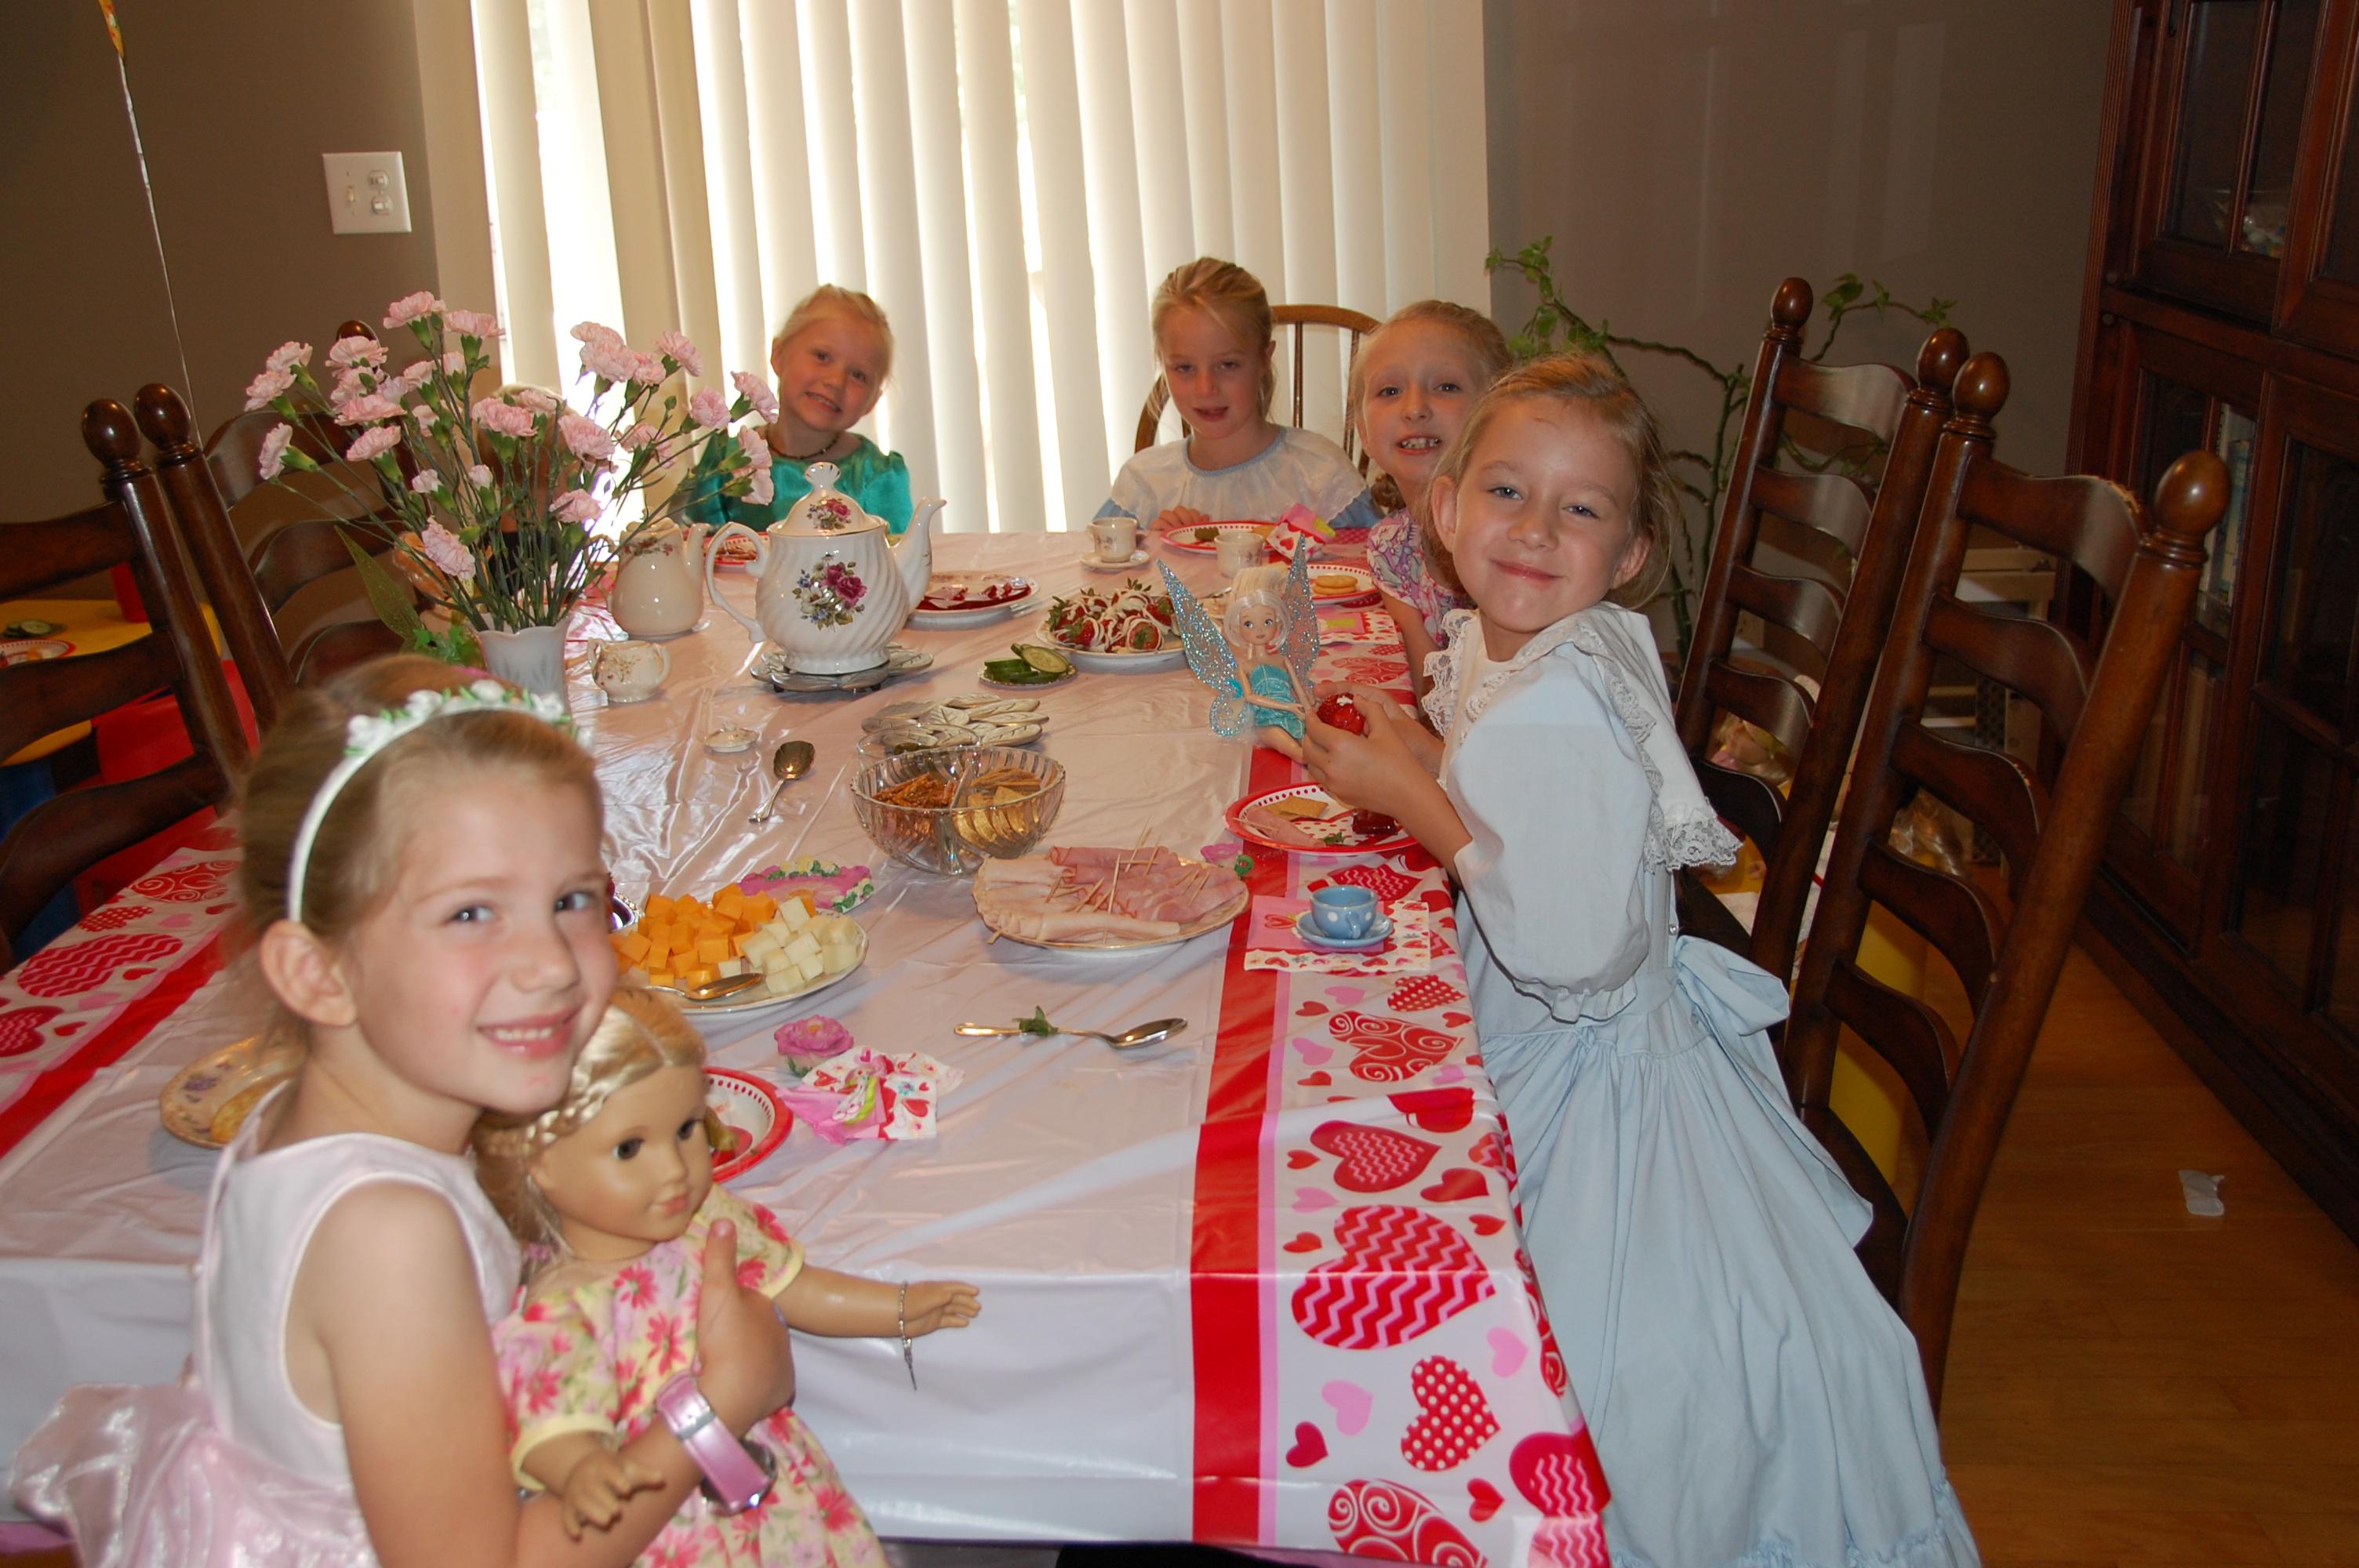 The girls enjoying the tea party.